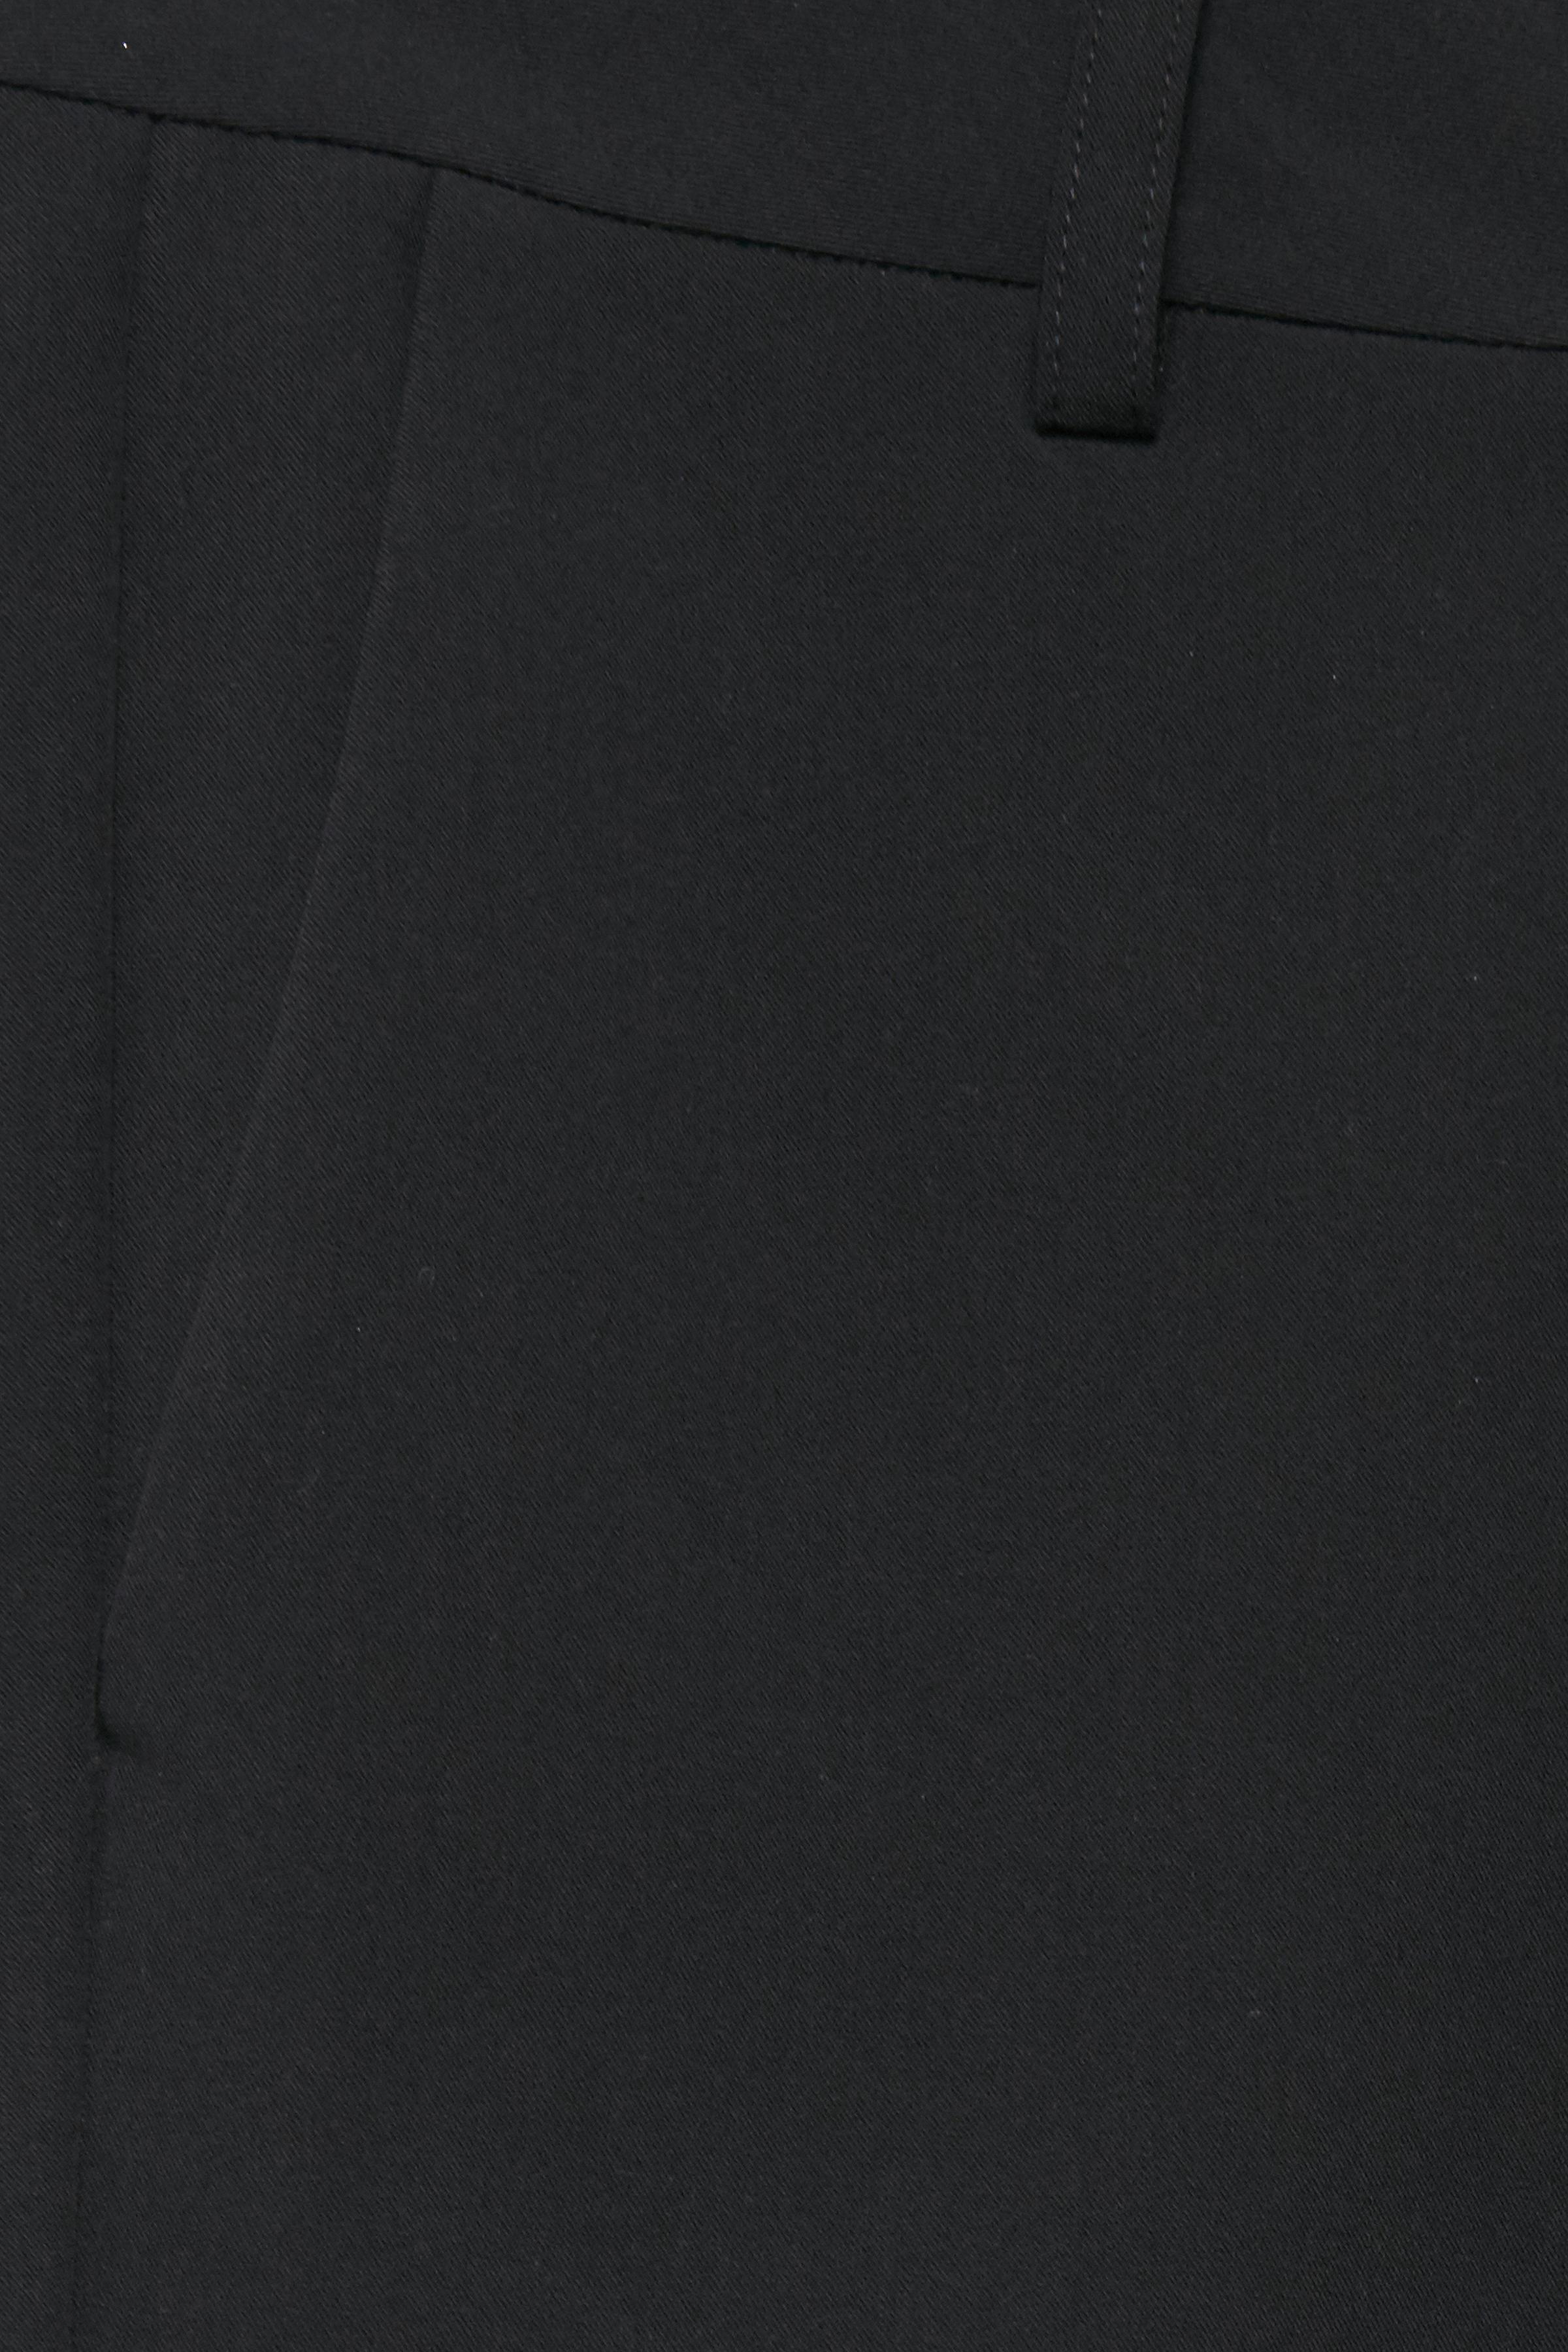 Sort Bukser fra Fransa – Køb Sort Bukser fra str. 34-46 her